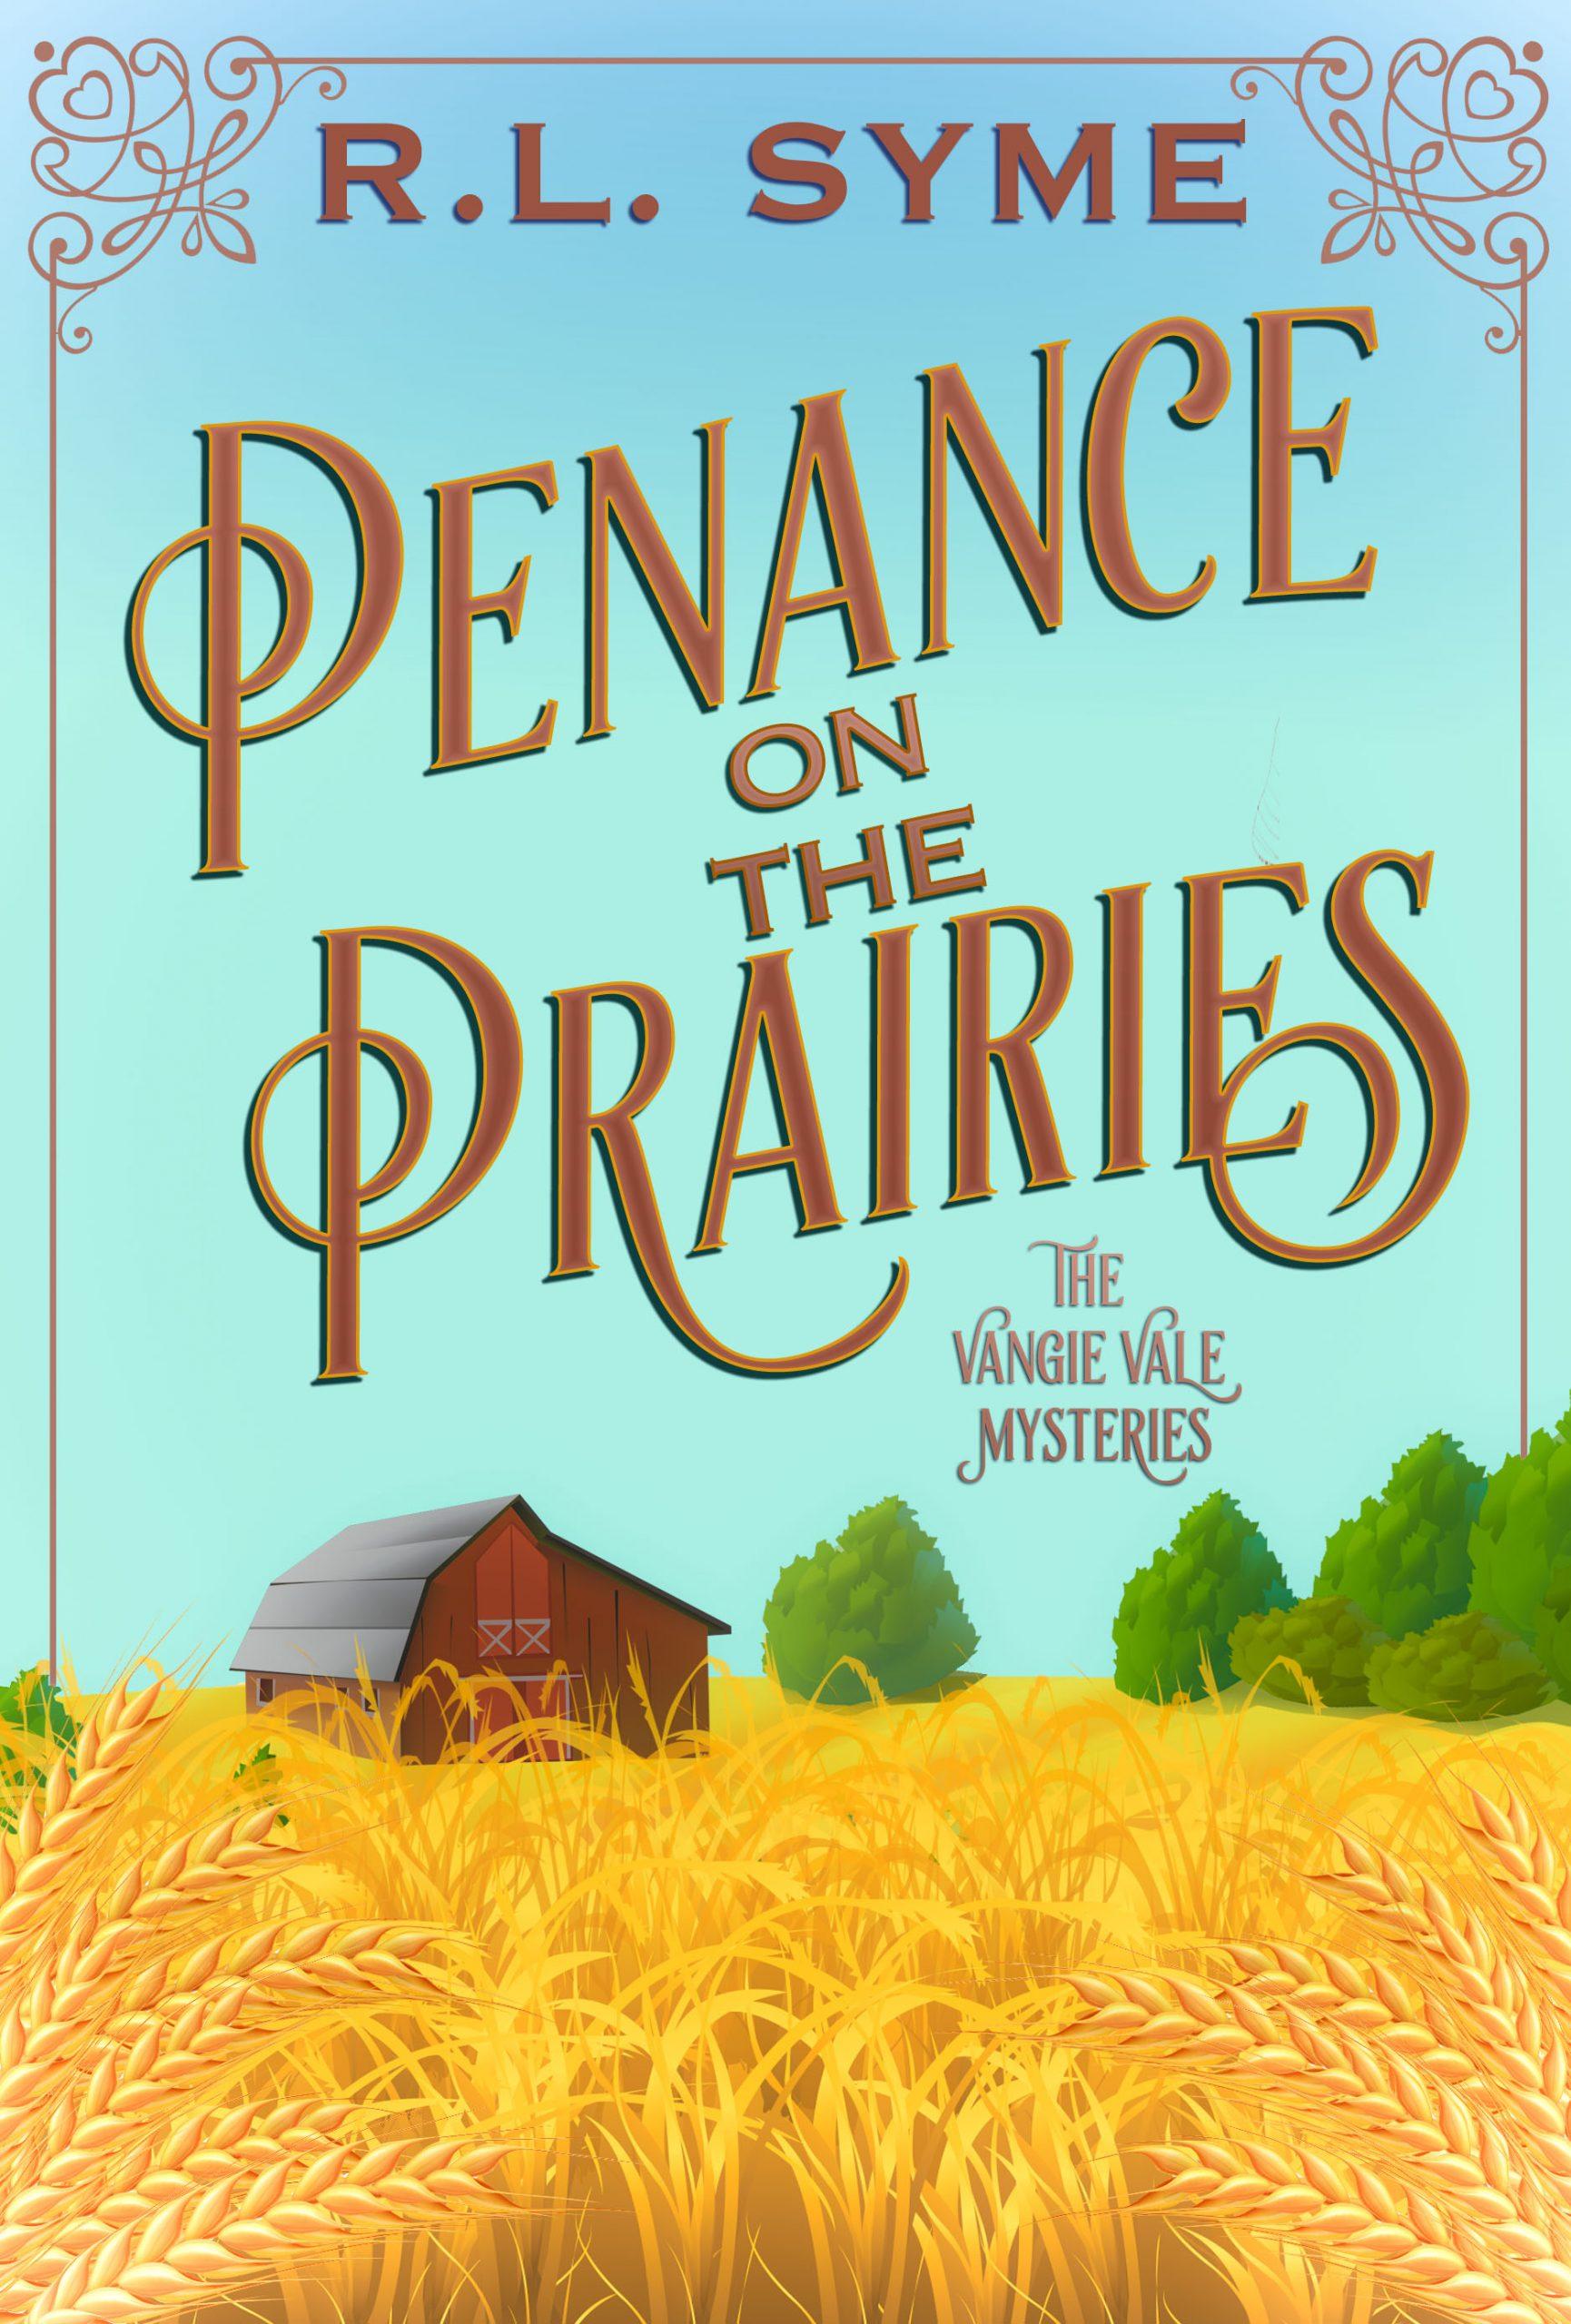 Penance on the Prairies